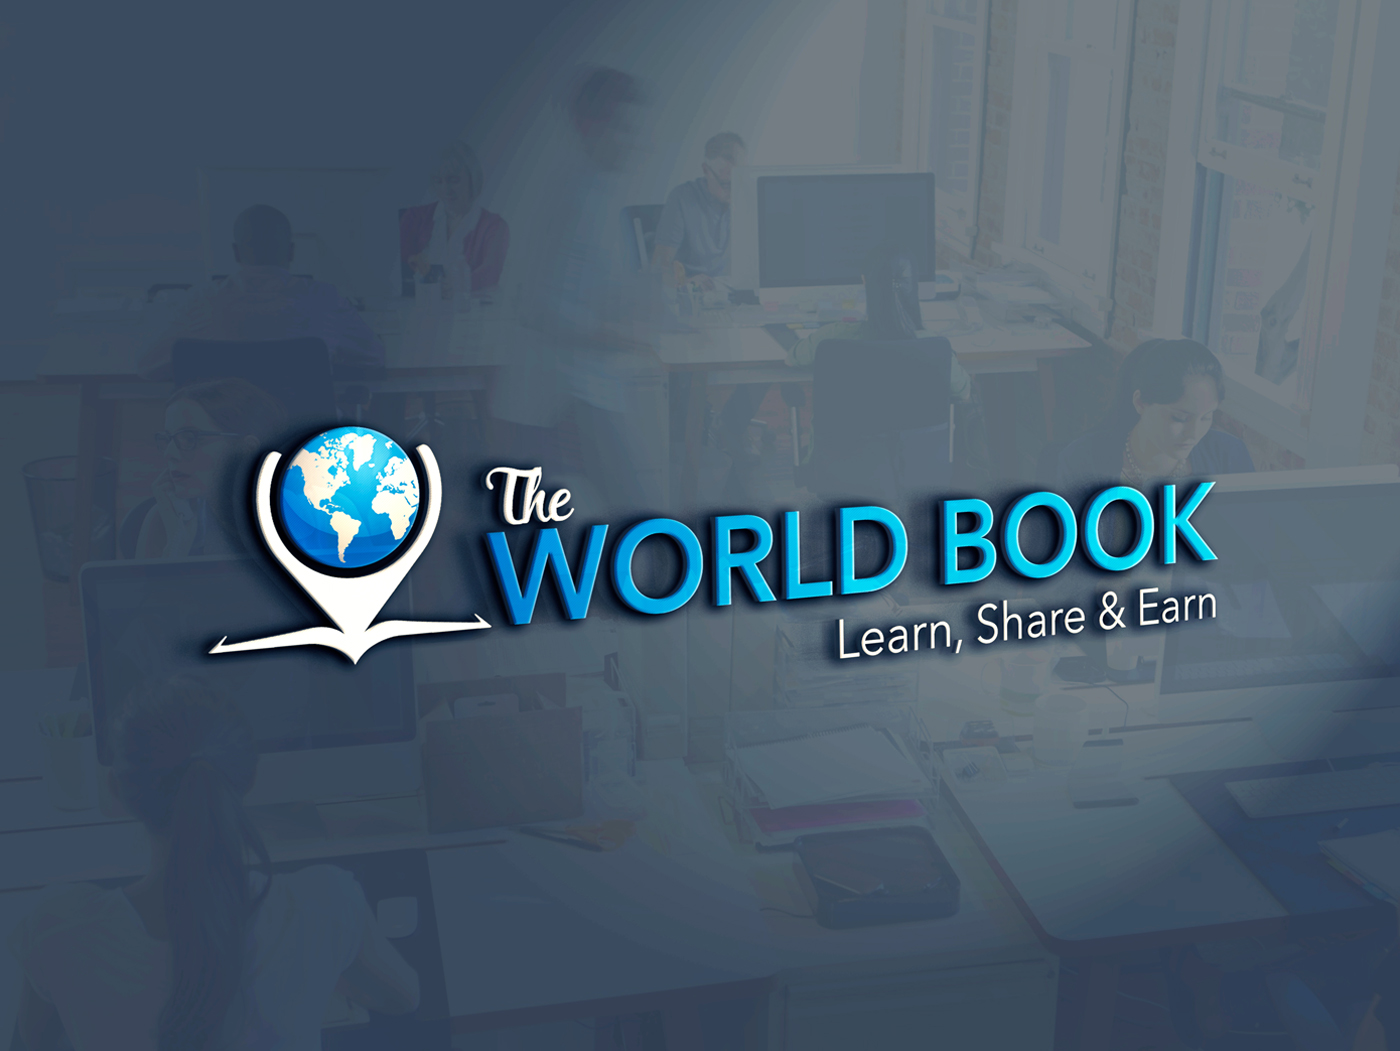 The World Book logo